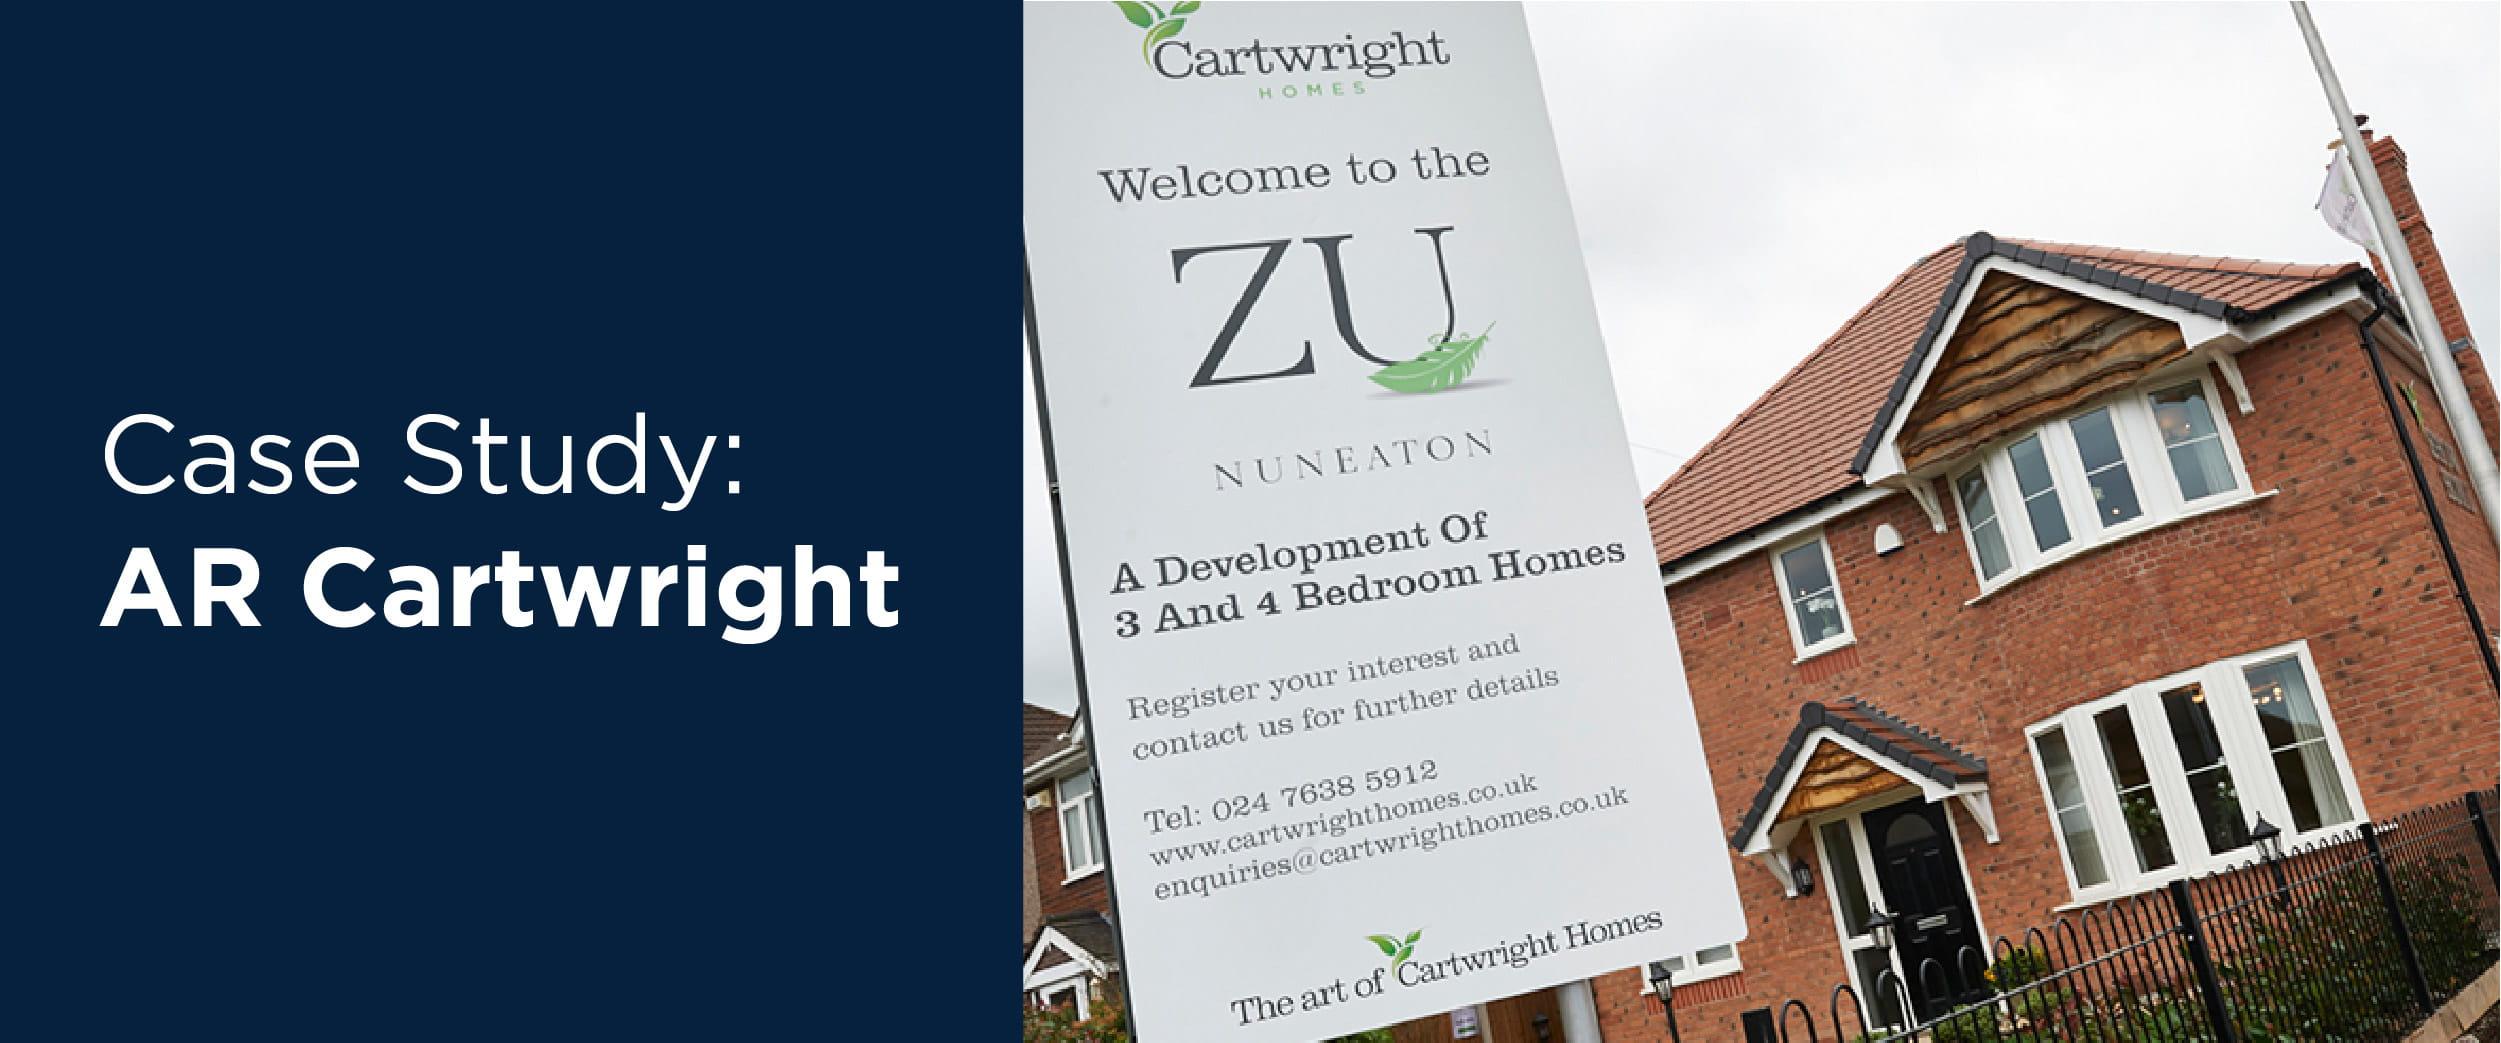 Case Study - AR Cartwright